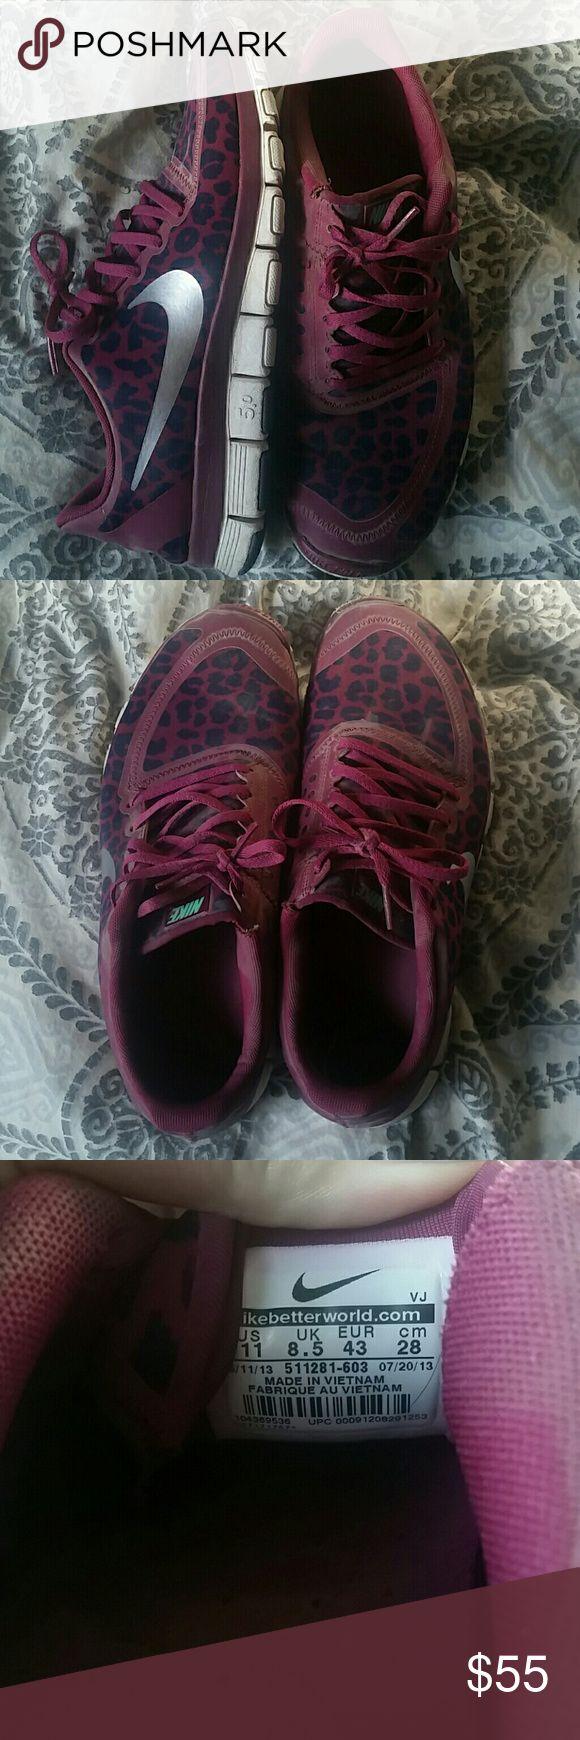 Nike Cheetah Print Shoes Purple Cheetah Print Nike's, worn a handful of times. Still in great condition. Smoke Free Home. Nike Shoes